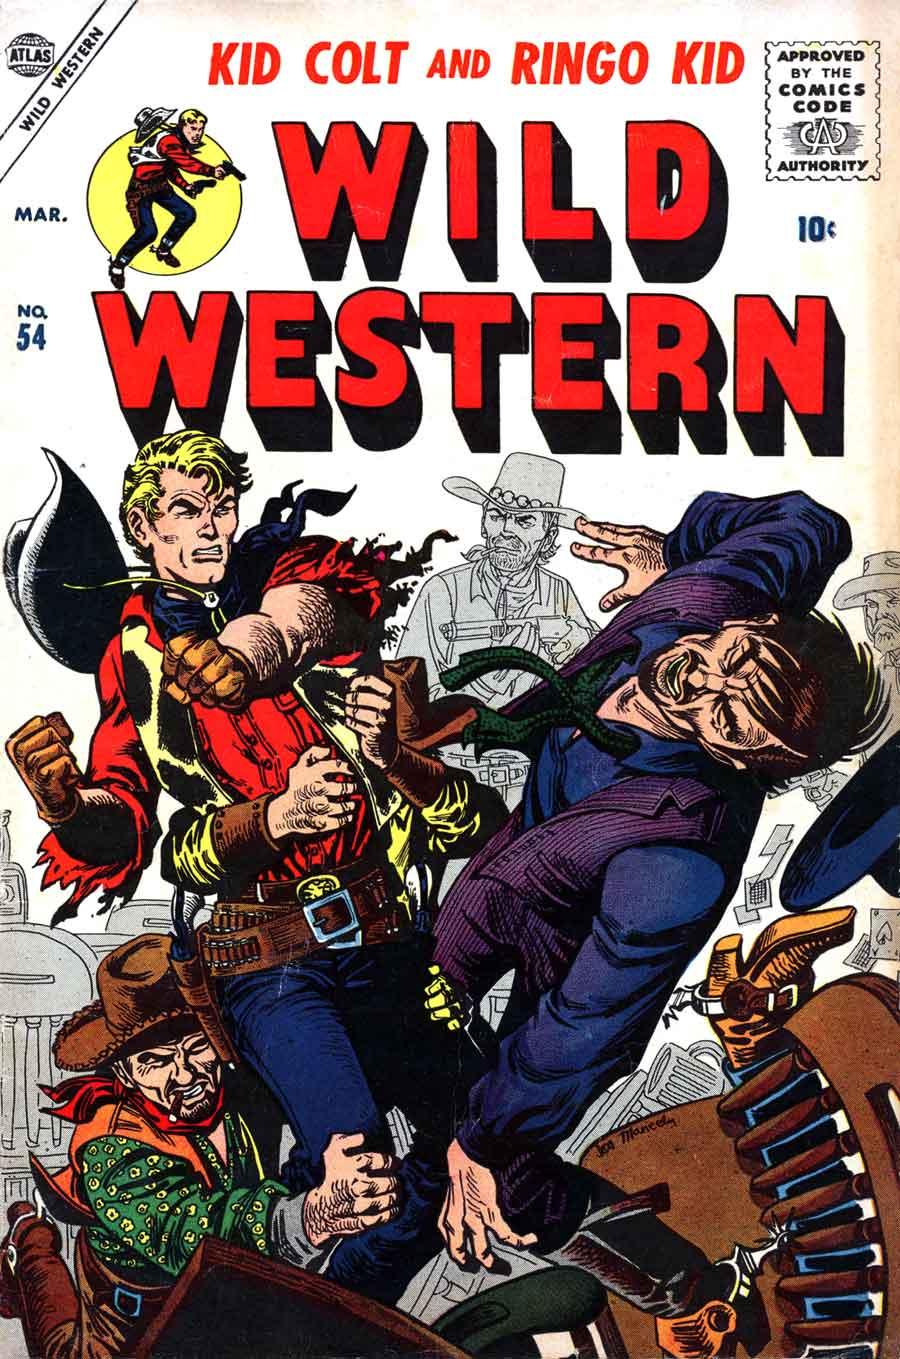 Wild Western #54 golden age atlas western1950s comic book cover